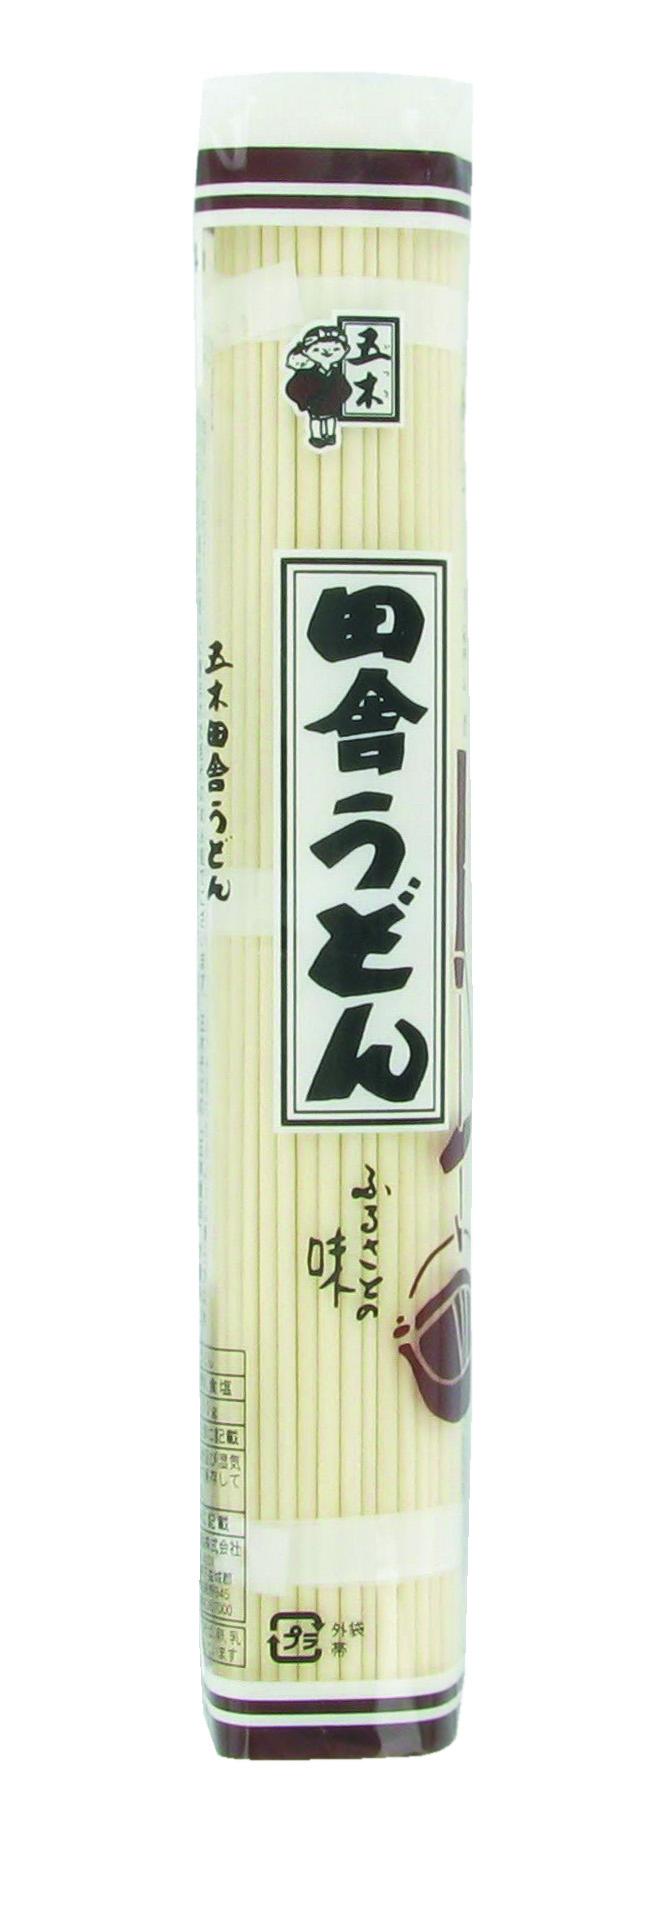 Nouilles Inaka Udon ITsuki (250 g)